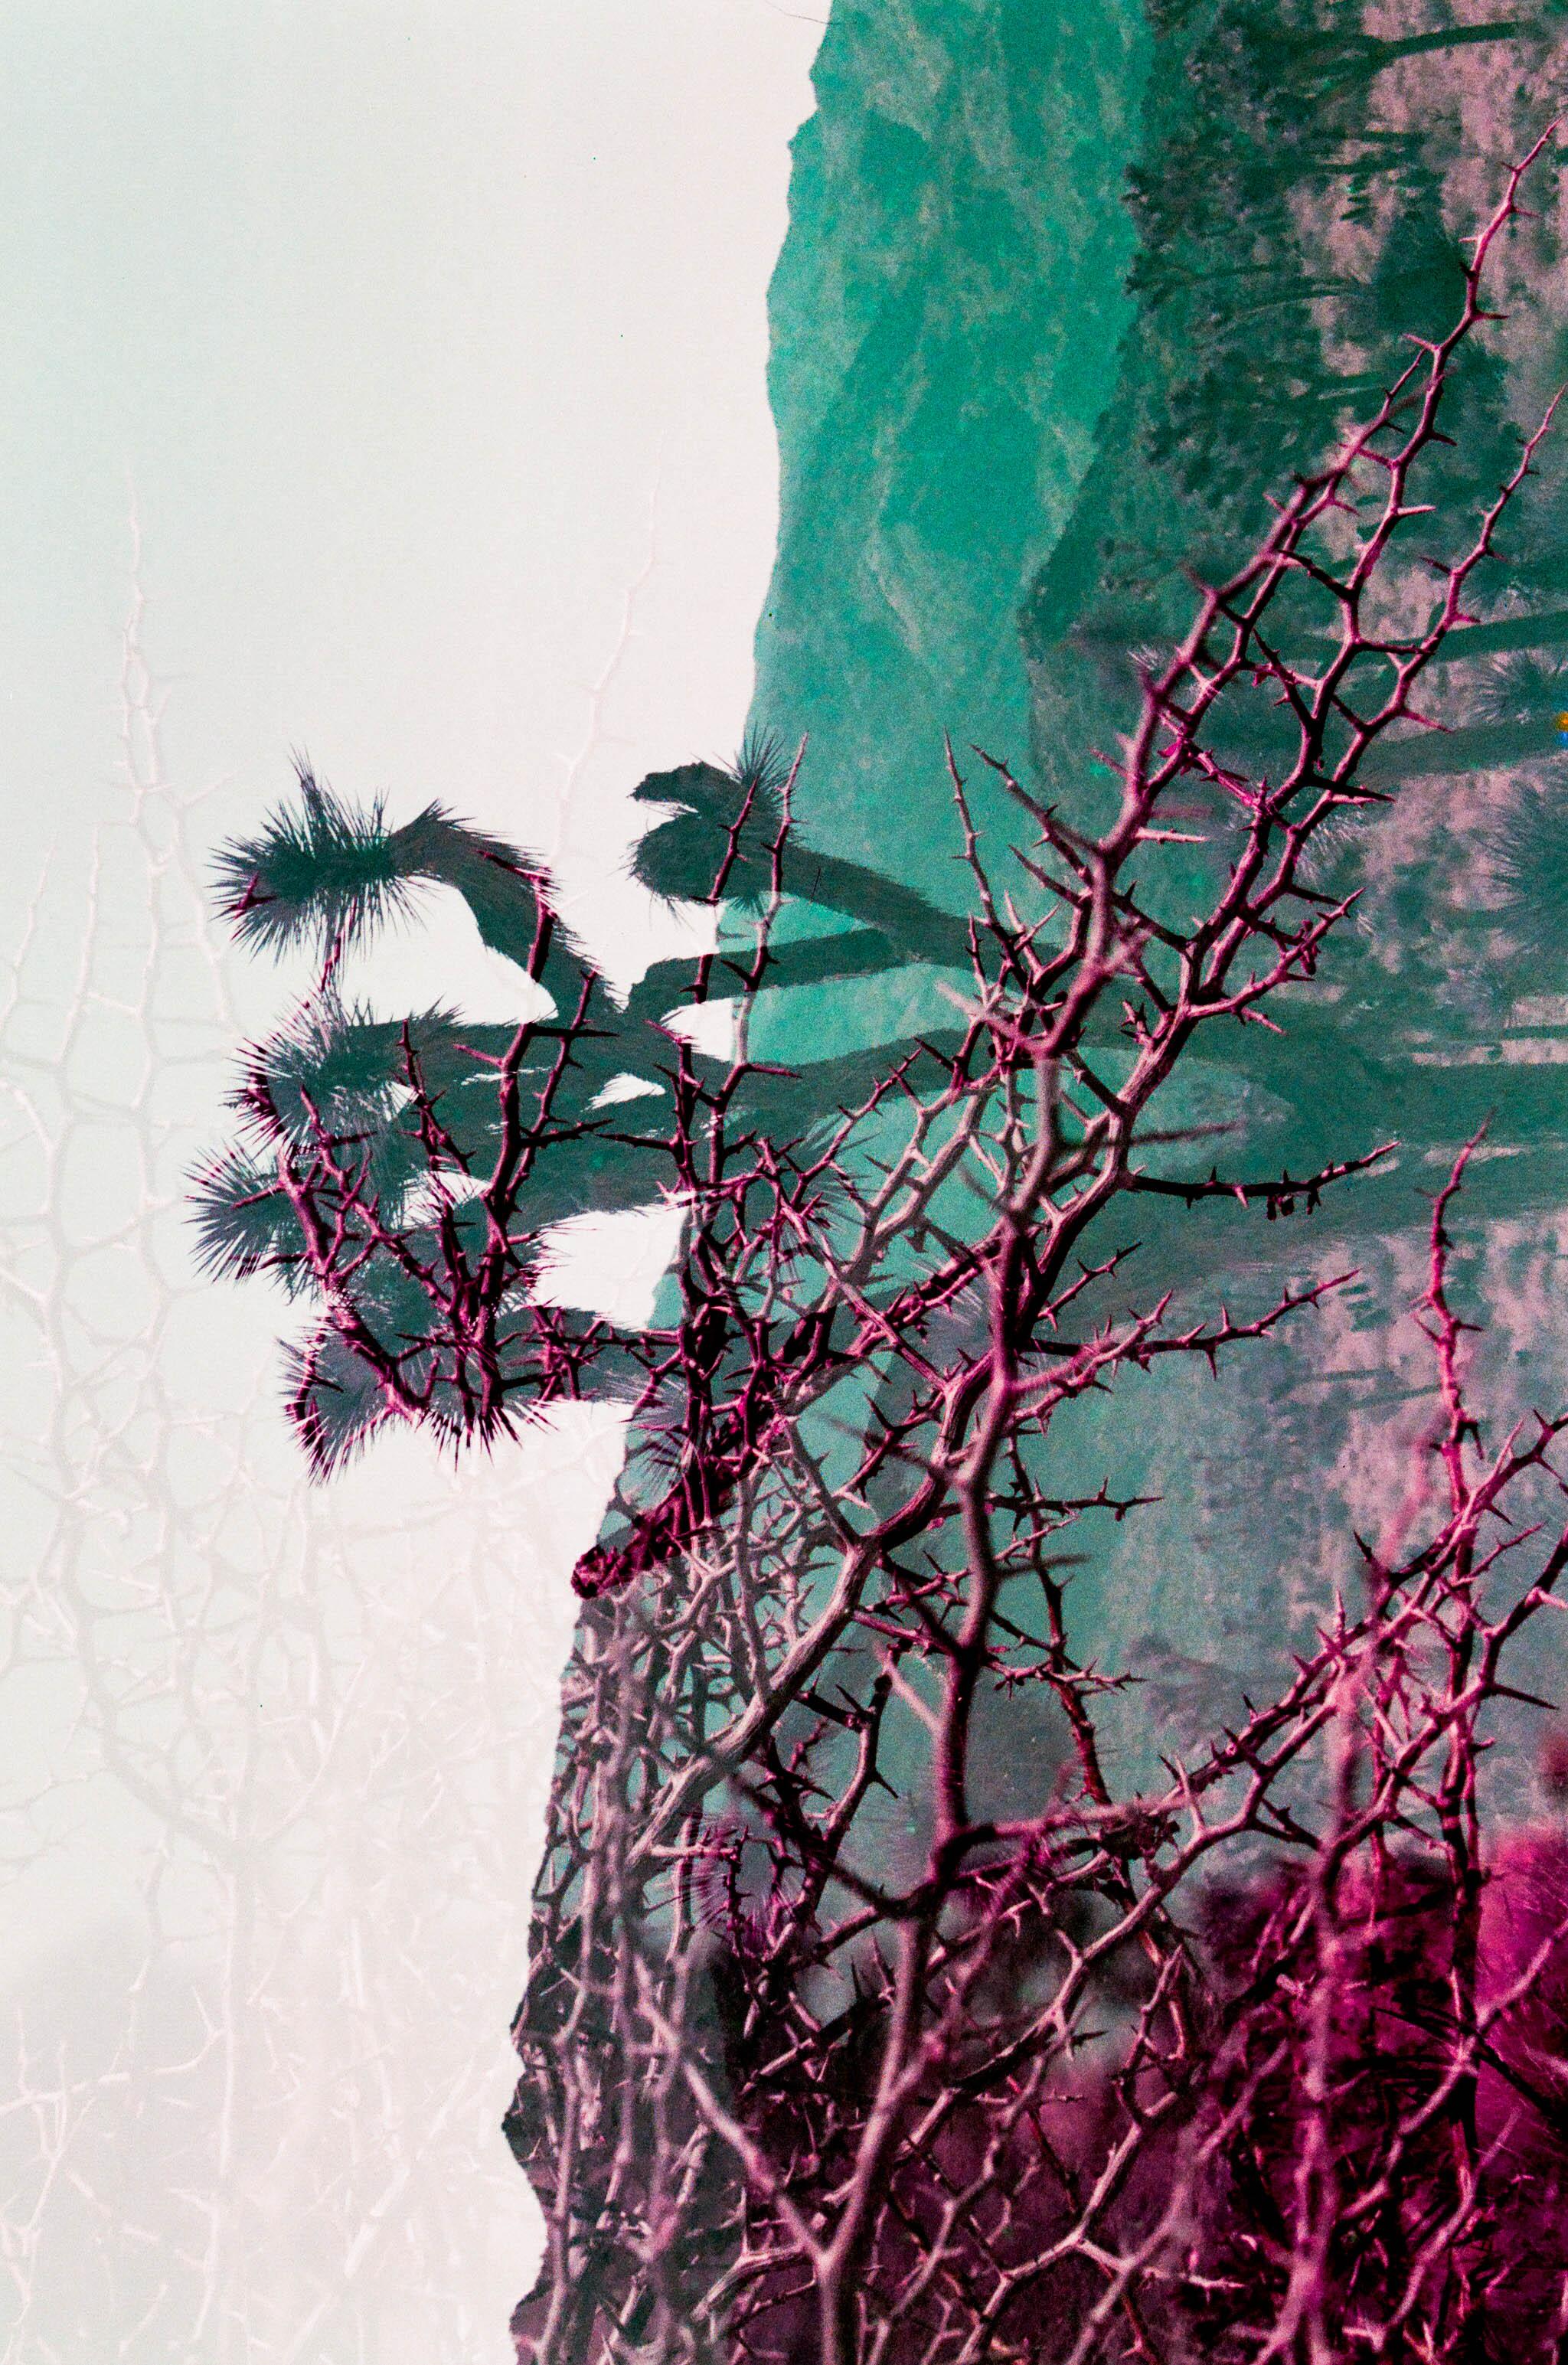 Joshua Tree - Mac's Birthday 11.11.18 35mm-63.jpg